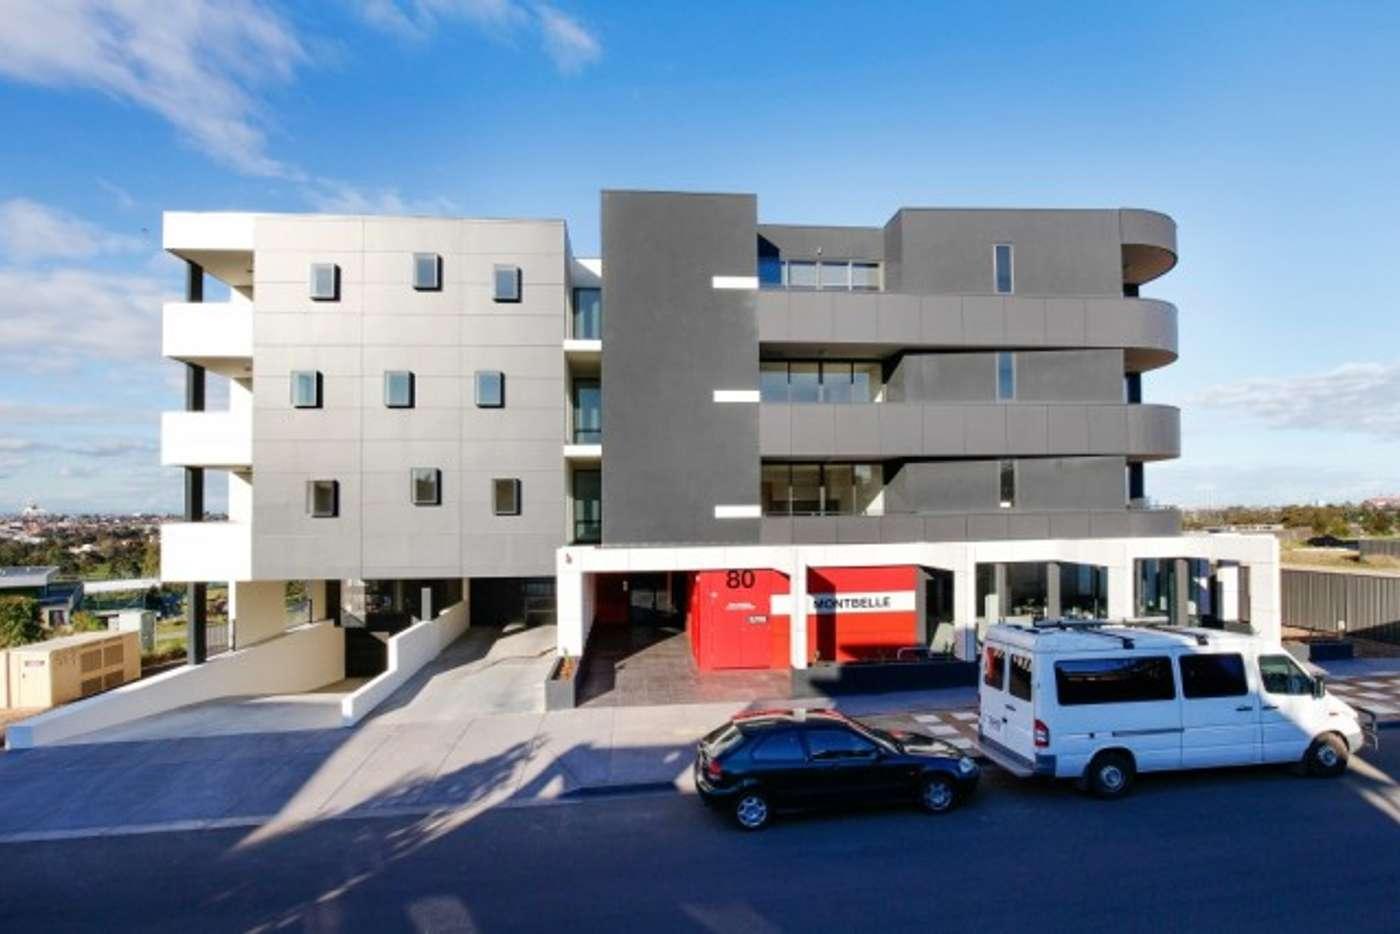 Main view of Homely apartment listing, 308/80 La Scala Avenue, Maribyrnong VIC 3032